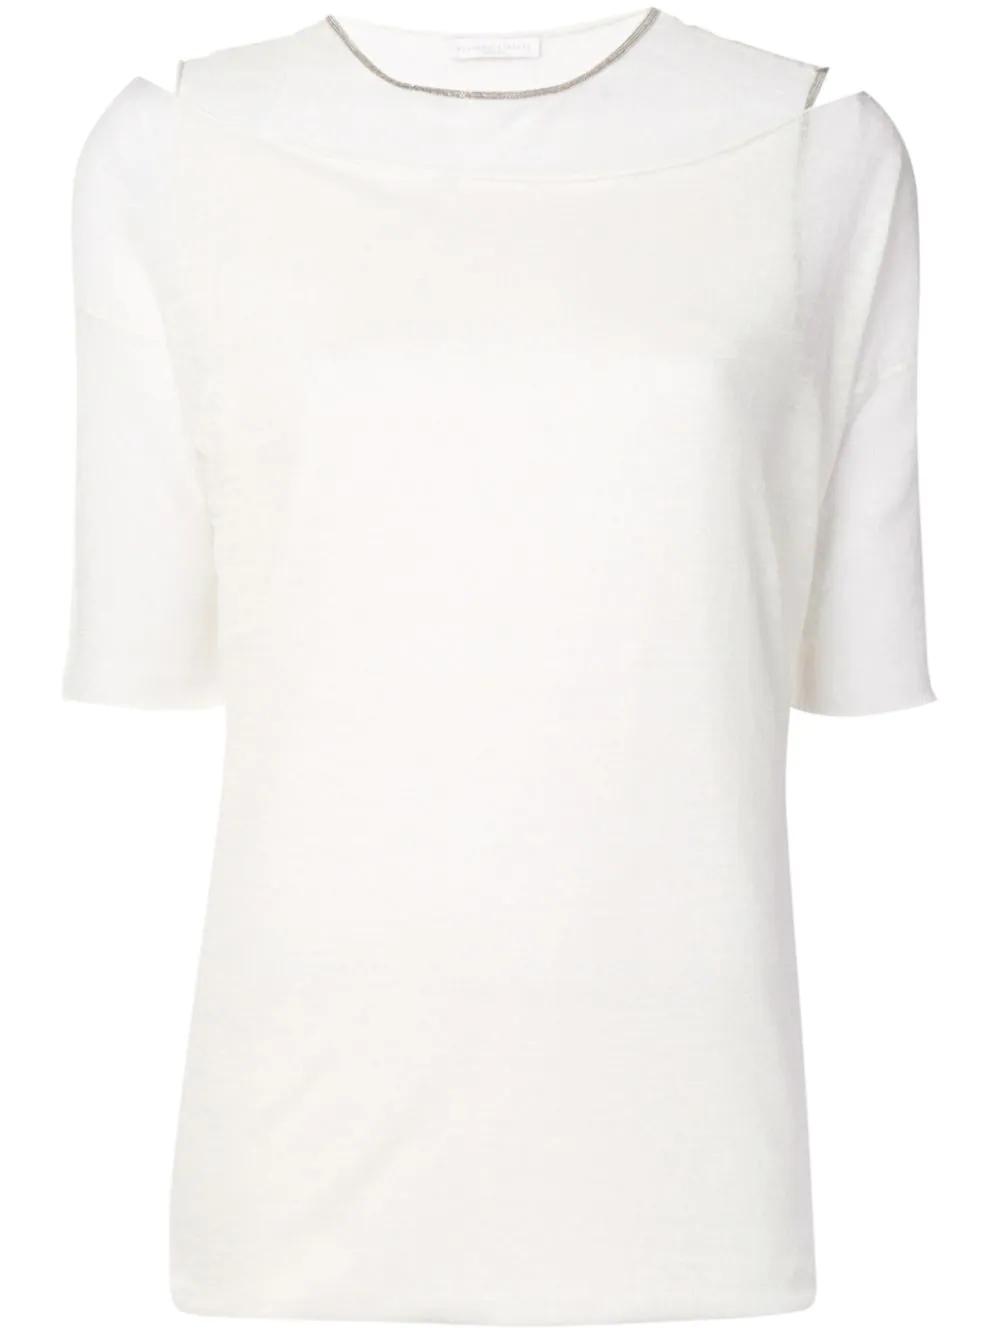 Fabiana Filippi | Fabiana Filippi классическая футболка | Clouty